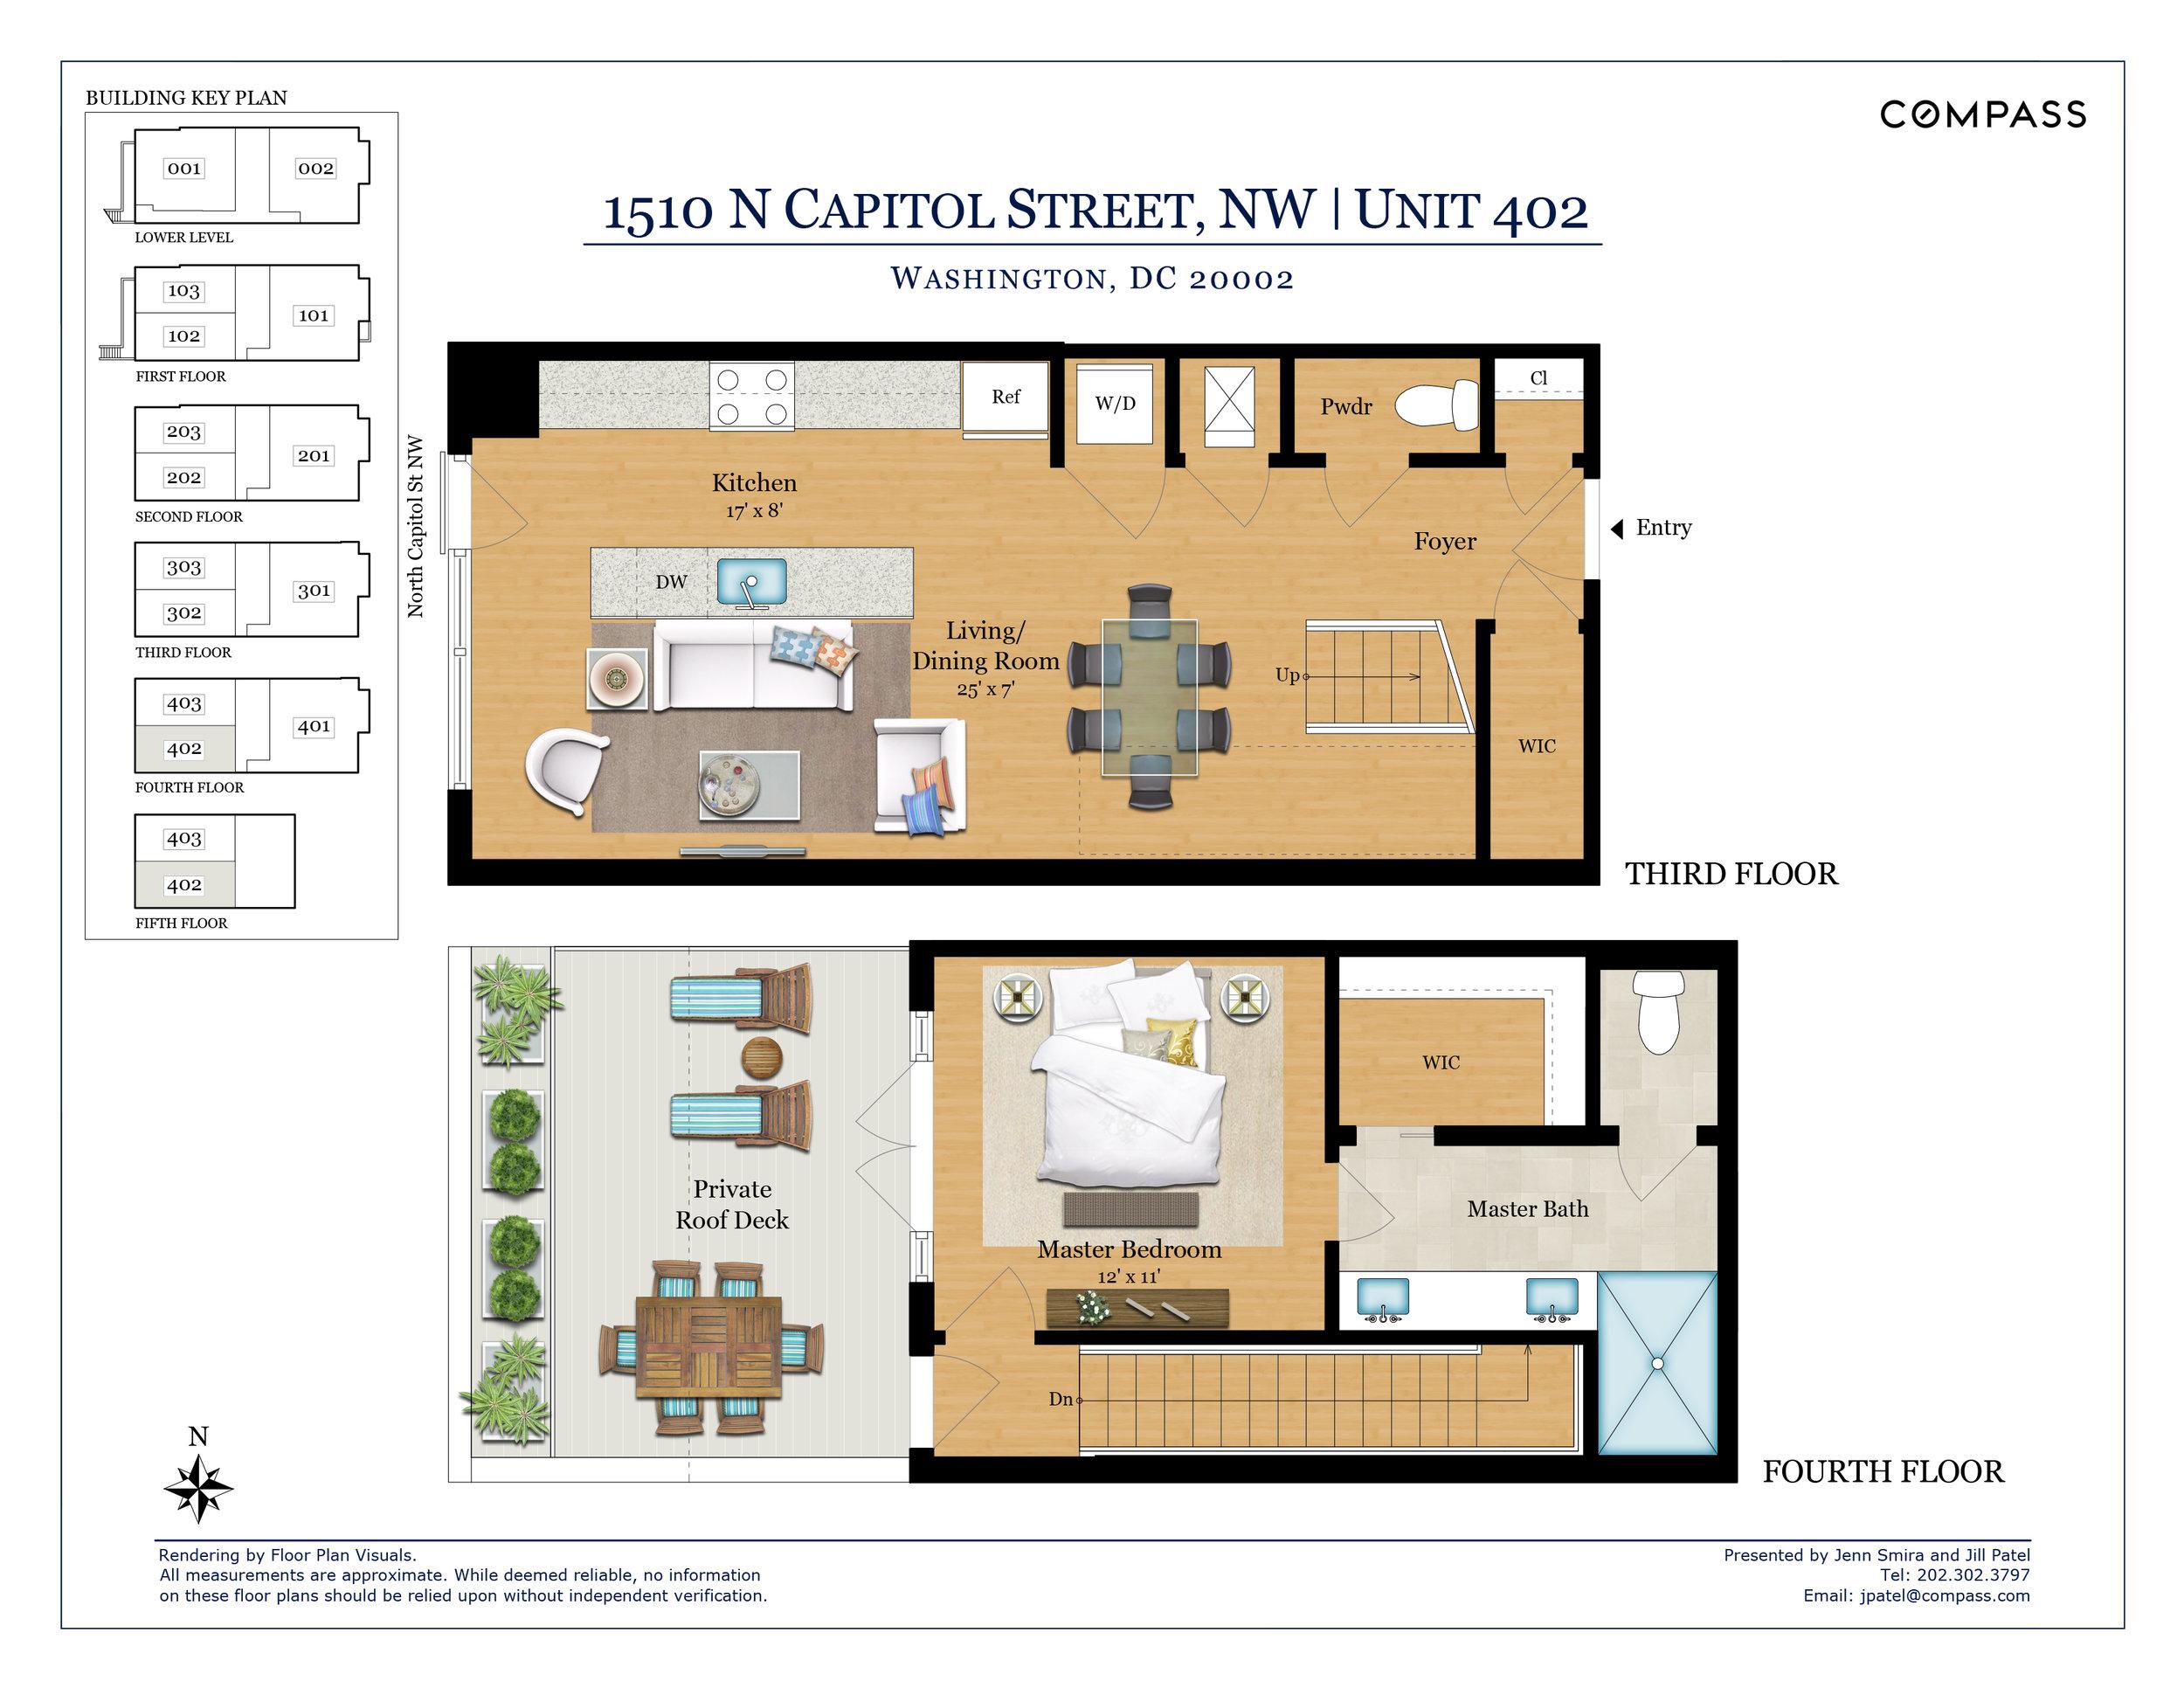 JS-1510N_CapitolStNW#402-FloorPlan-Print-R2.jpg